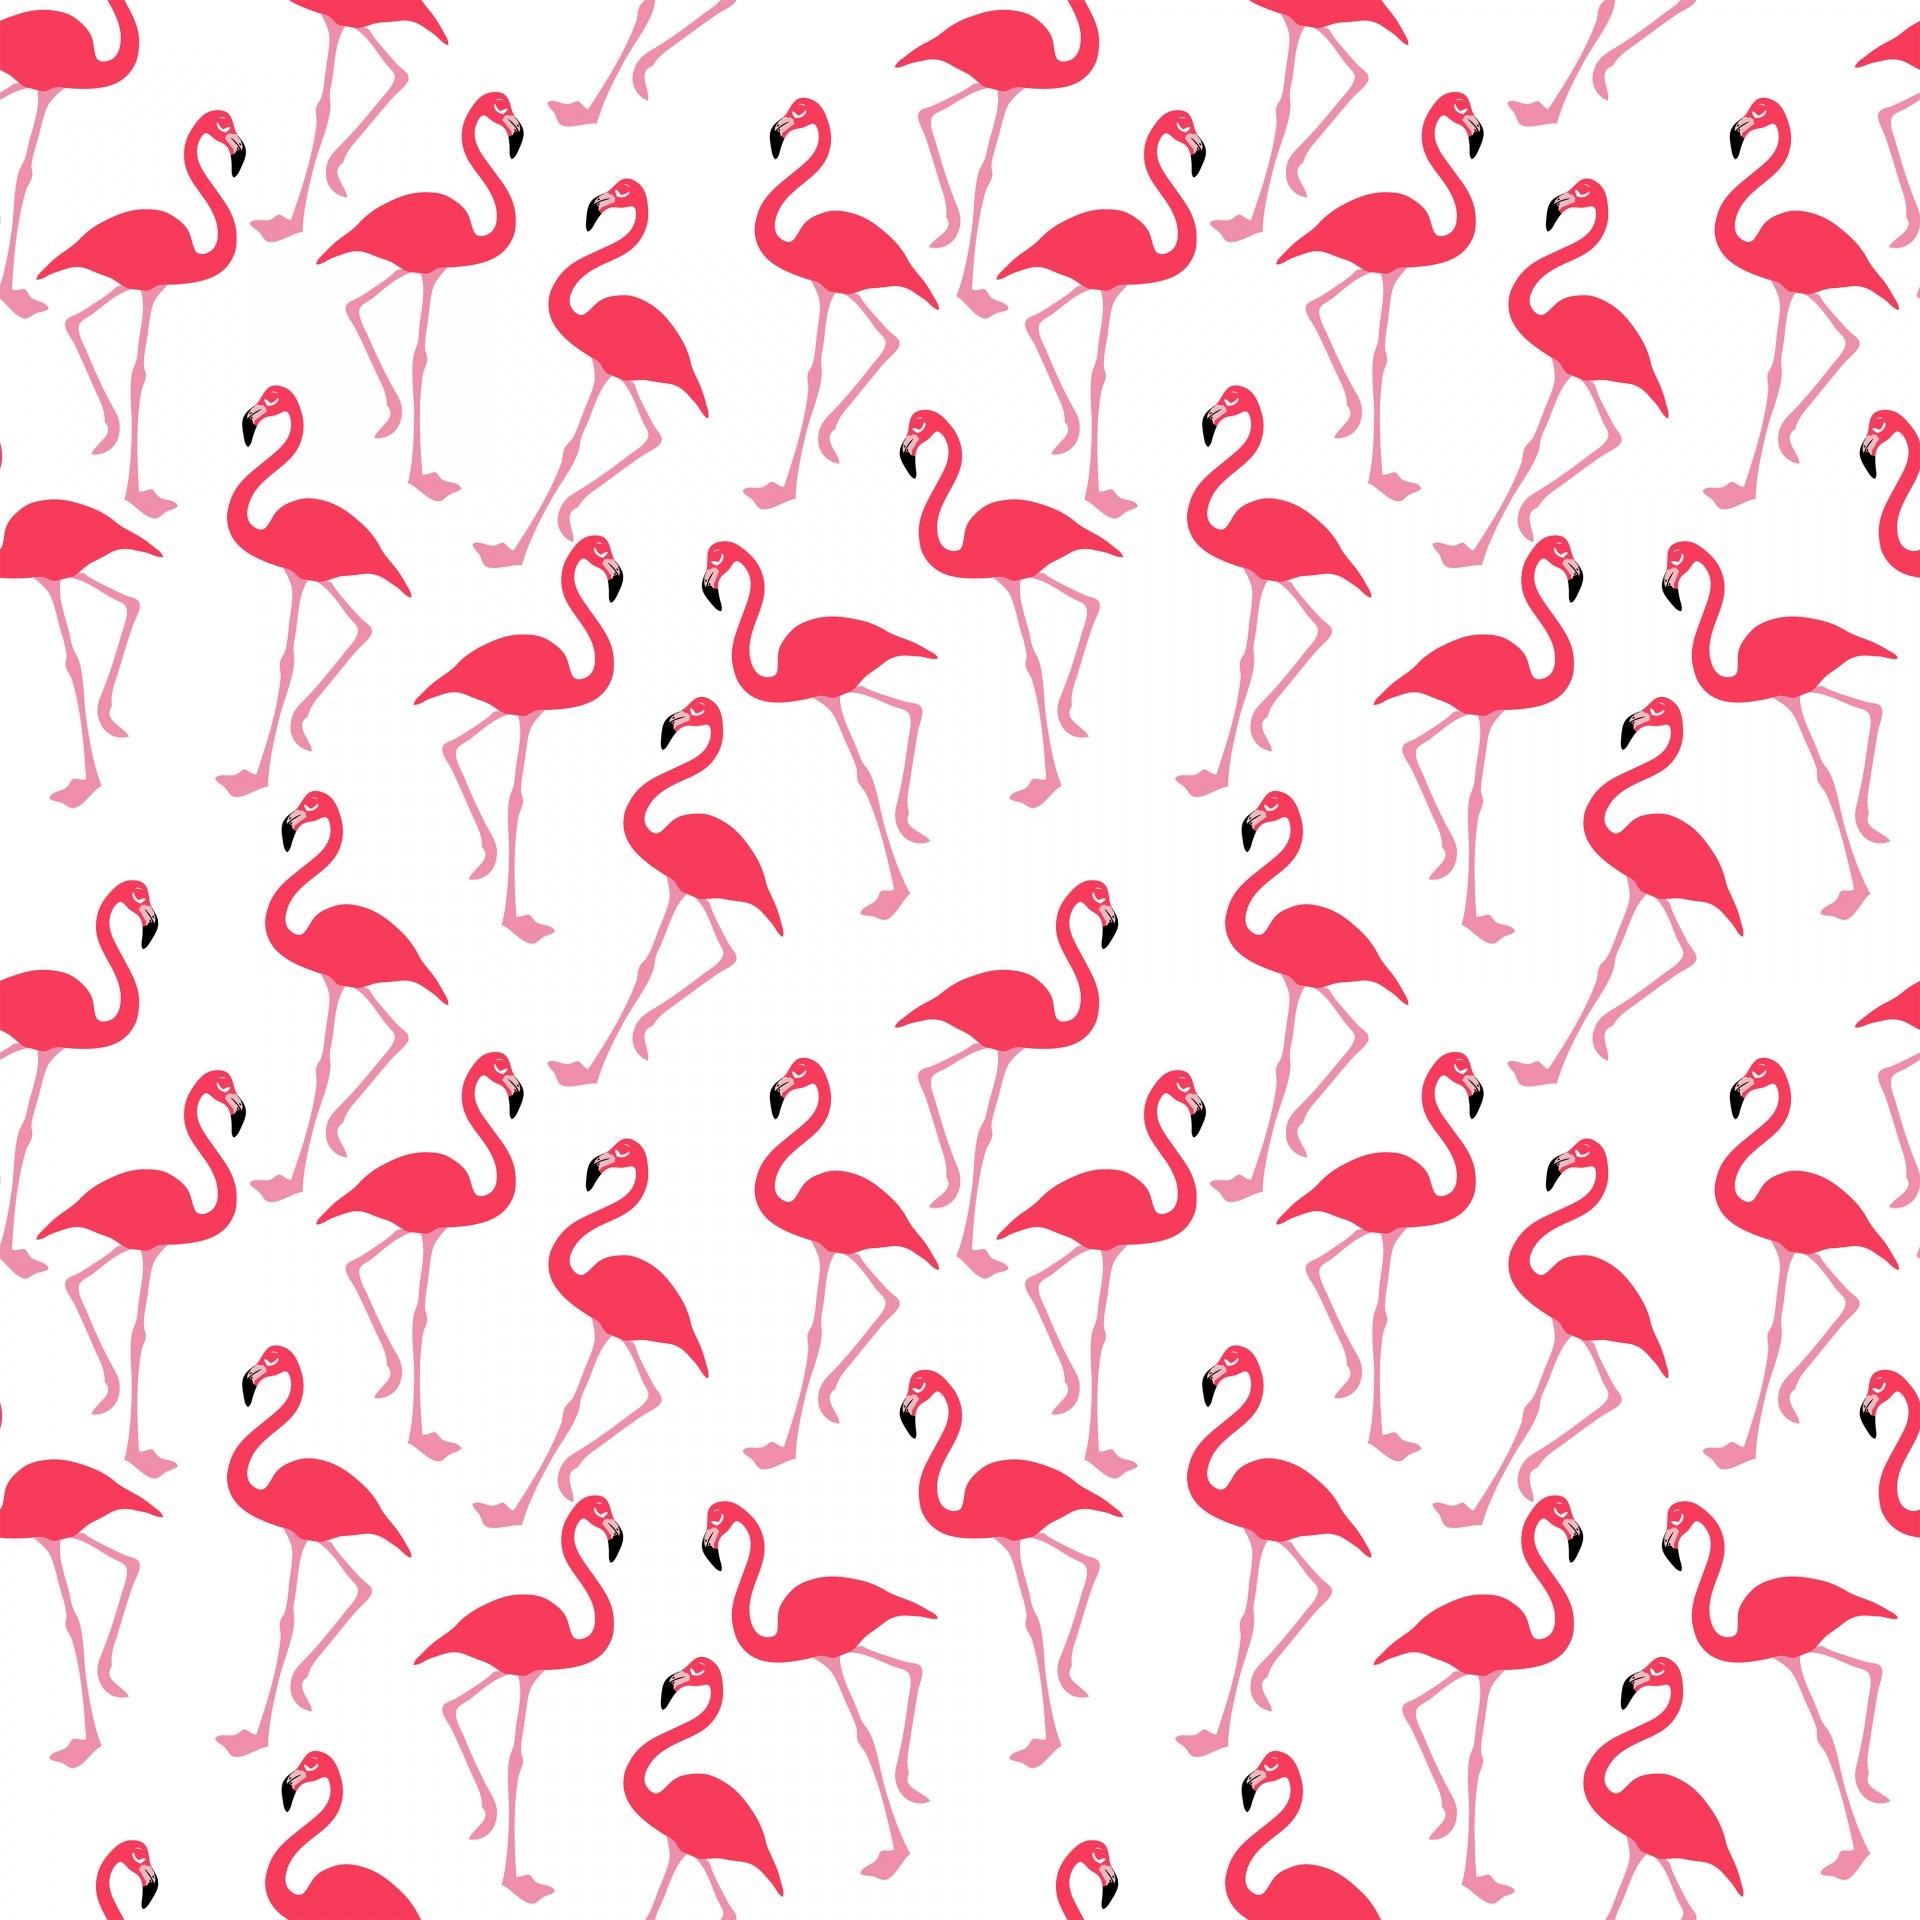 Flamingo Wallpaper Background Free Stock Photo - Public Domain